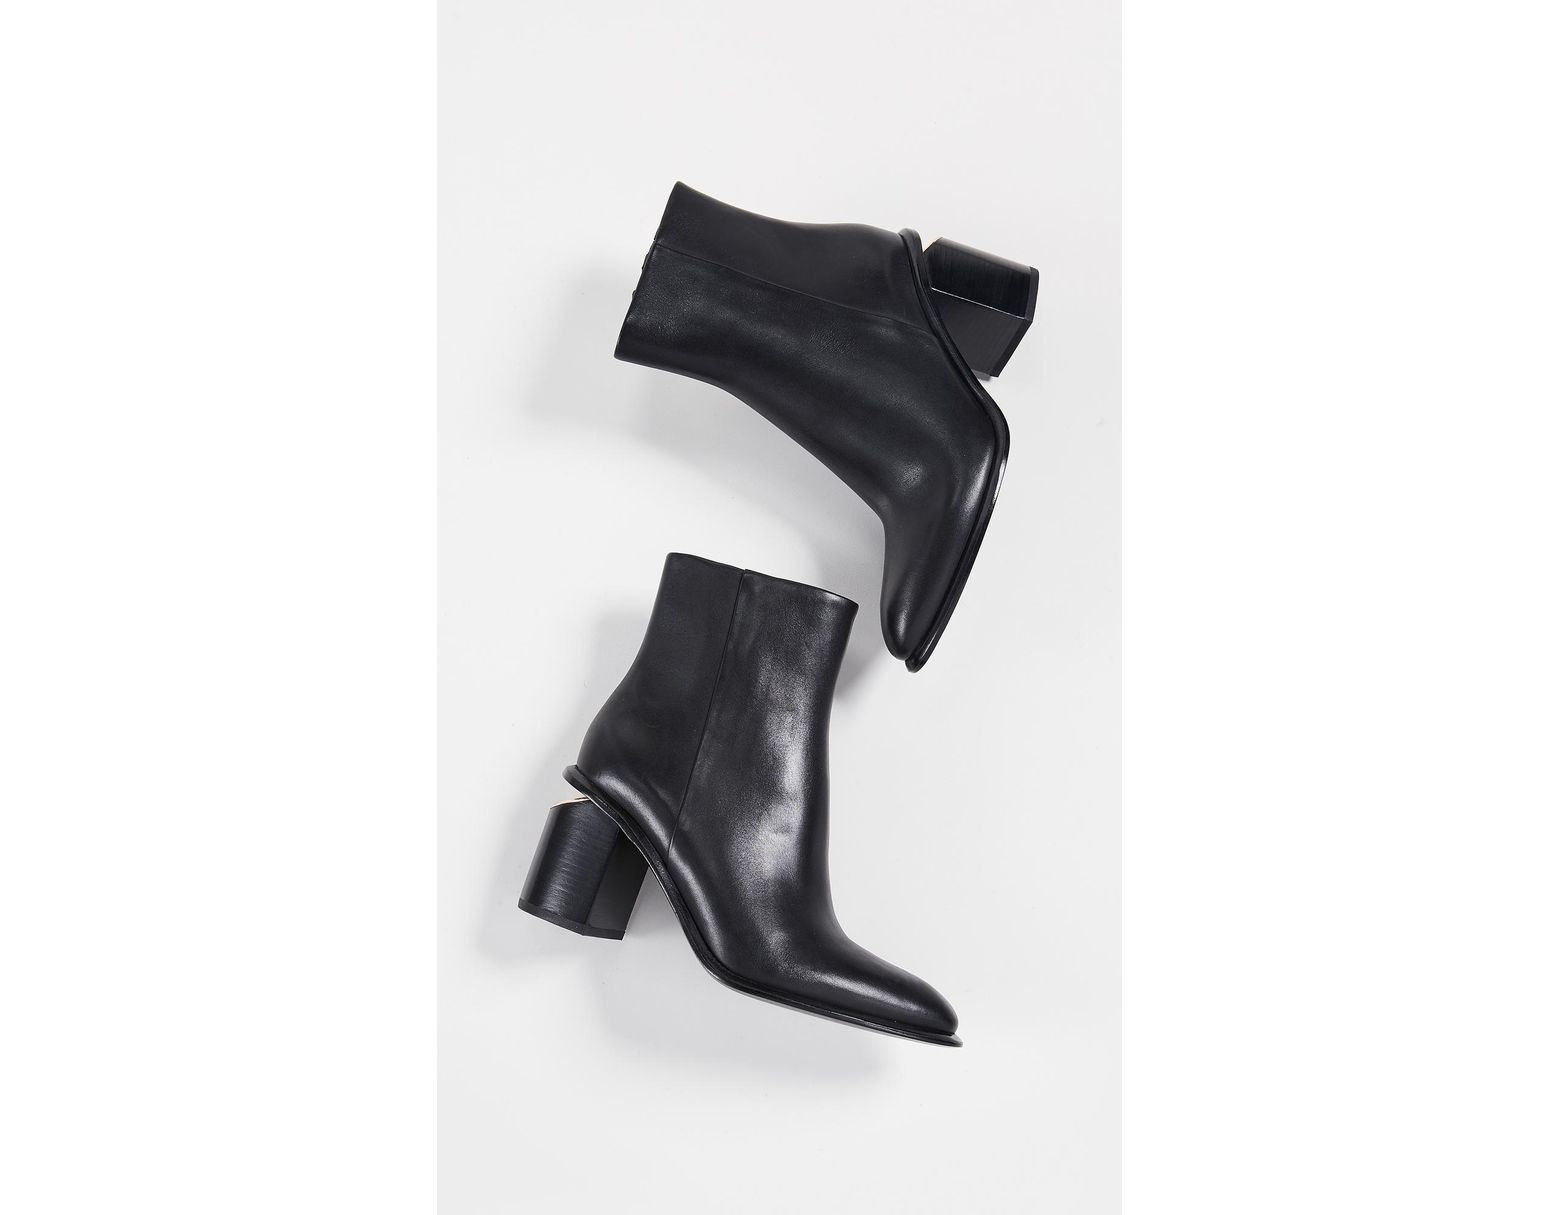 368873a98ddf Lyst - Alexander Wang Anna Mid Heel Booties in Black